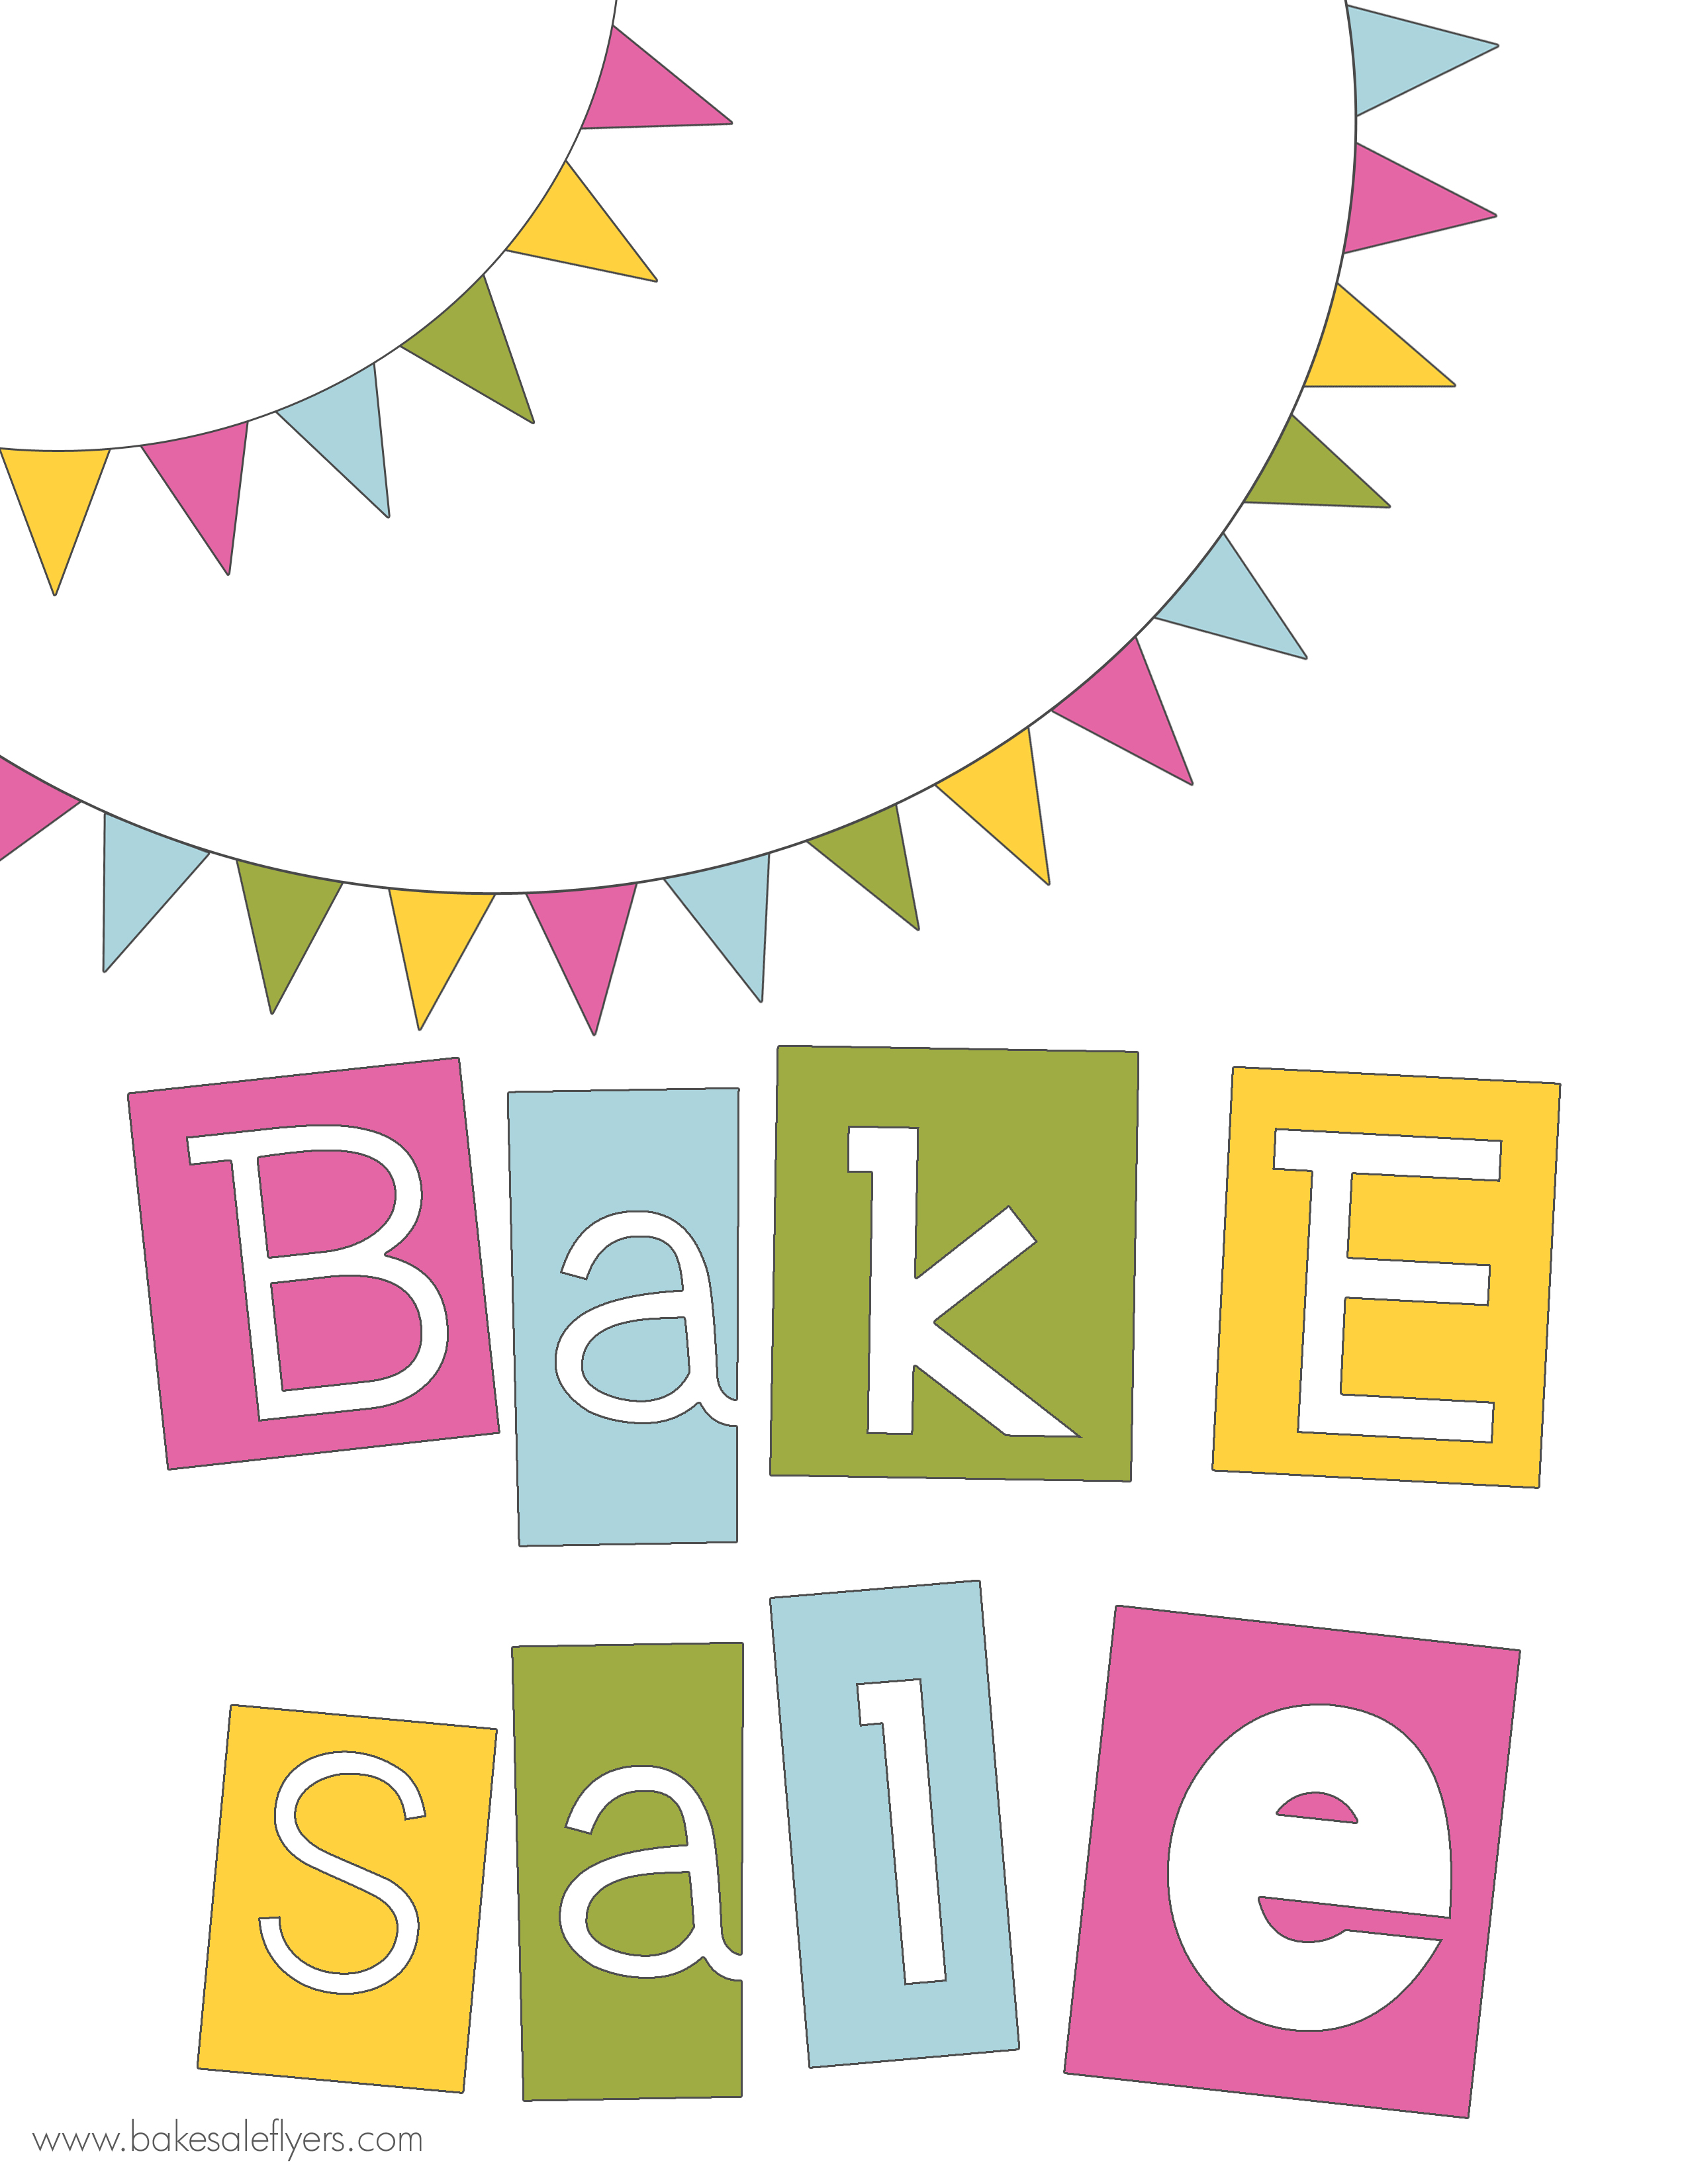 Bake Sale Clipart - Clipart Kid